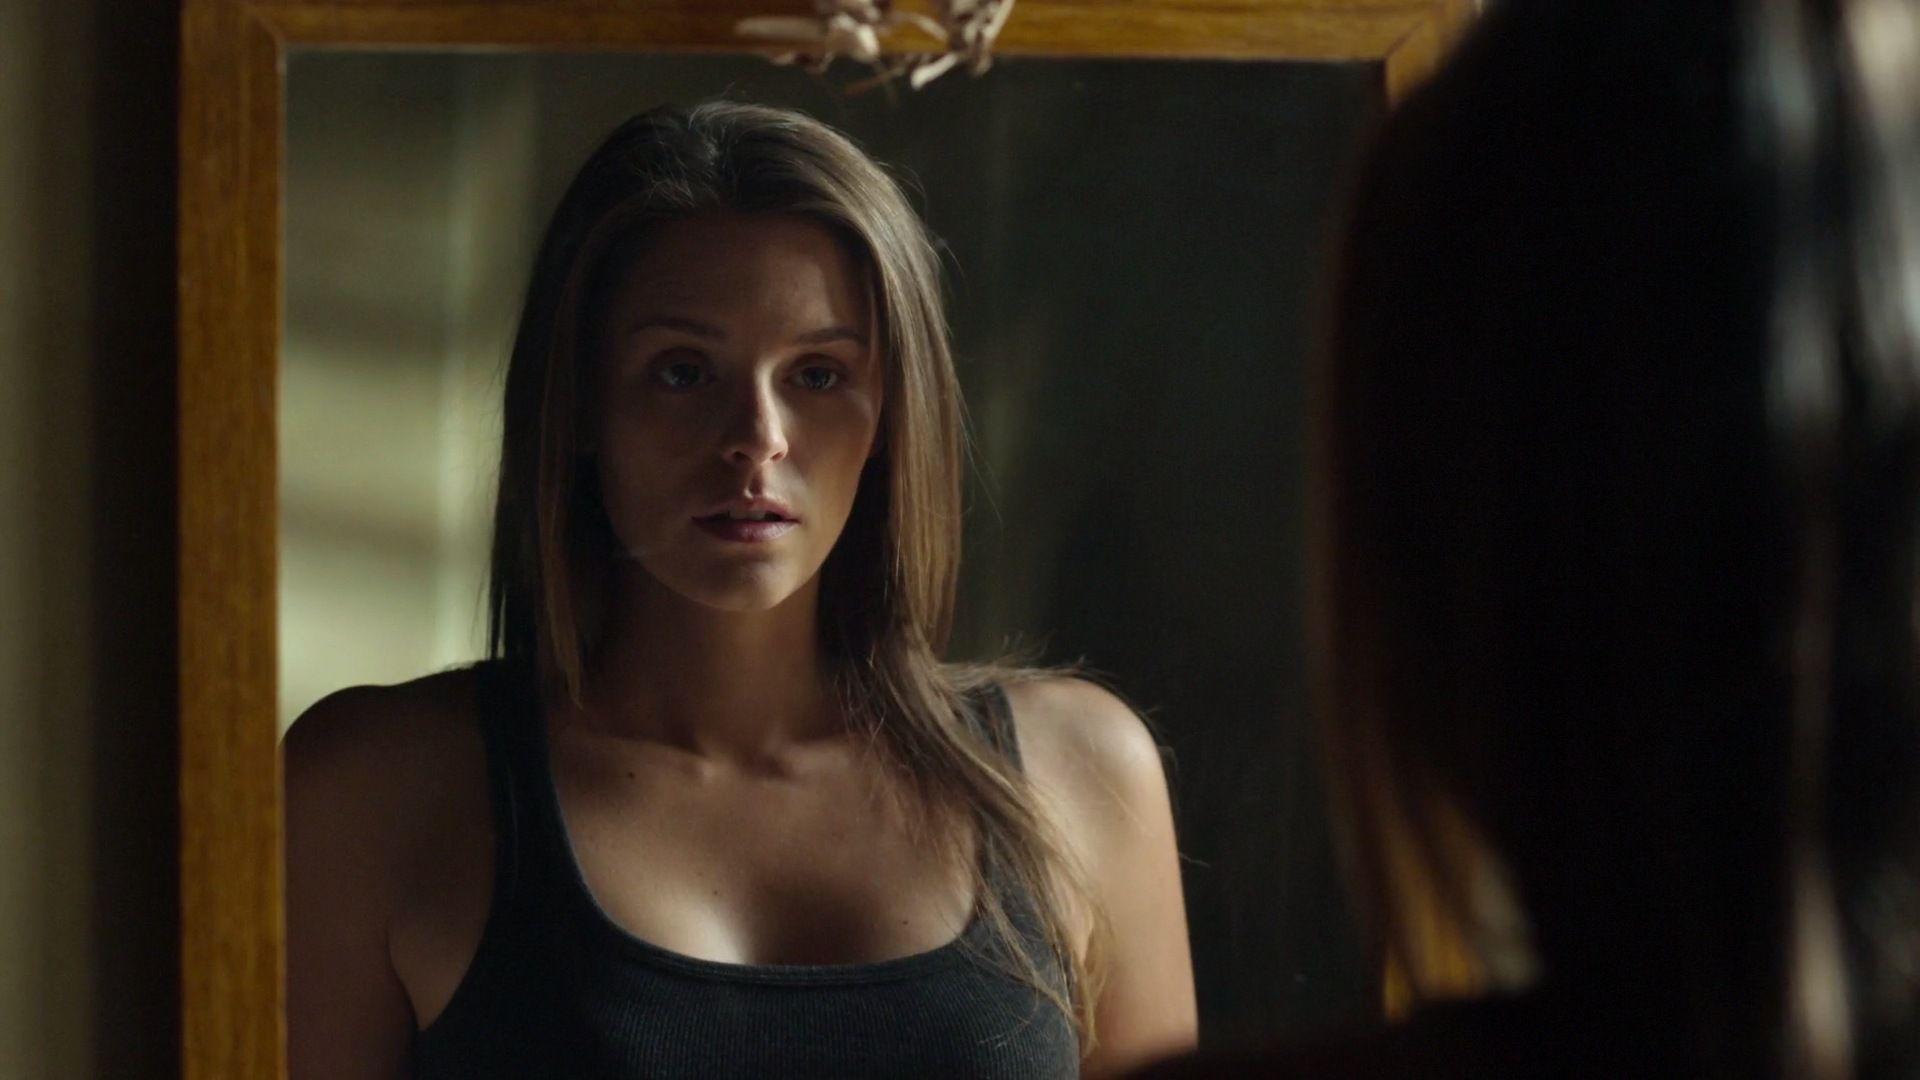 Jordan Hayes Actress | Hot Girl HD Wallpaper